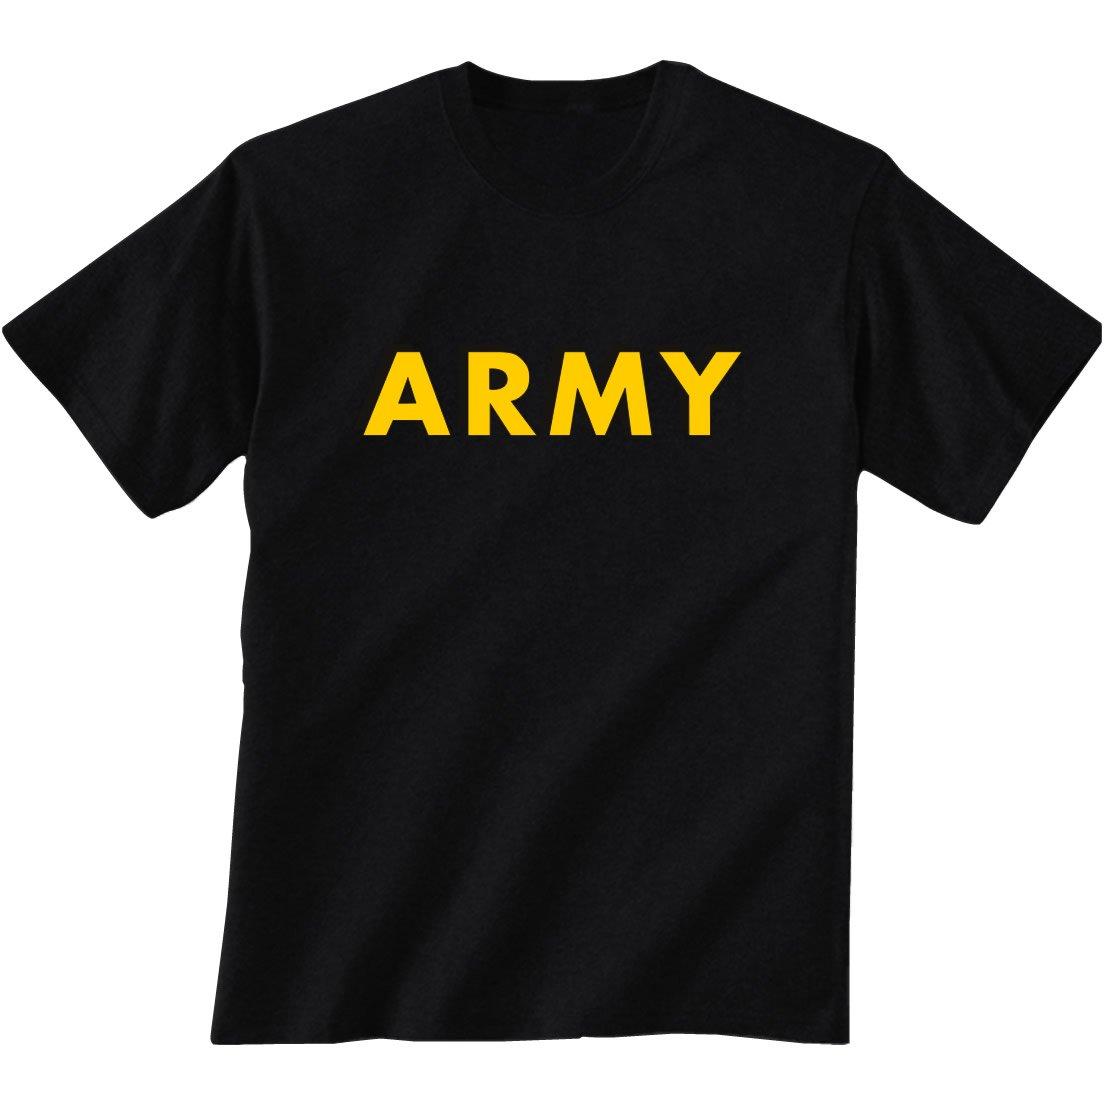 Black ARMY Short Sleeve T-Shirt with gold print - Medium